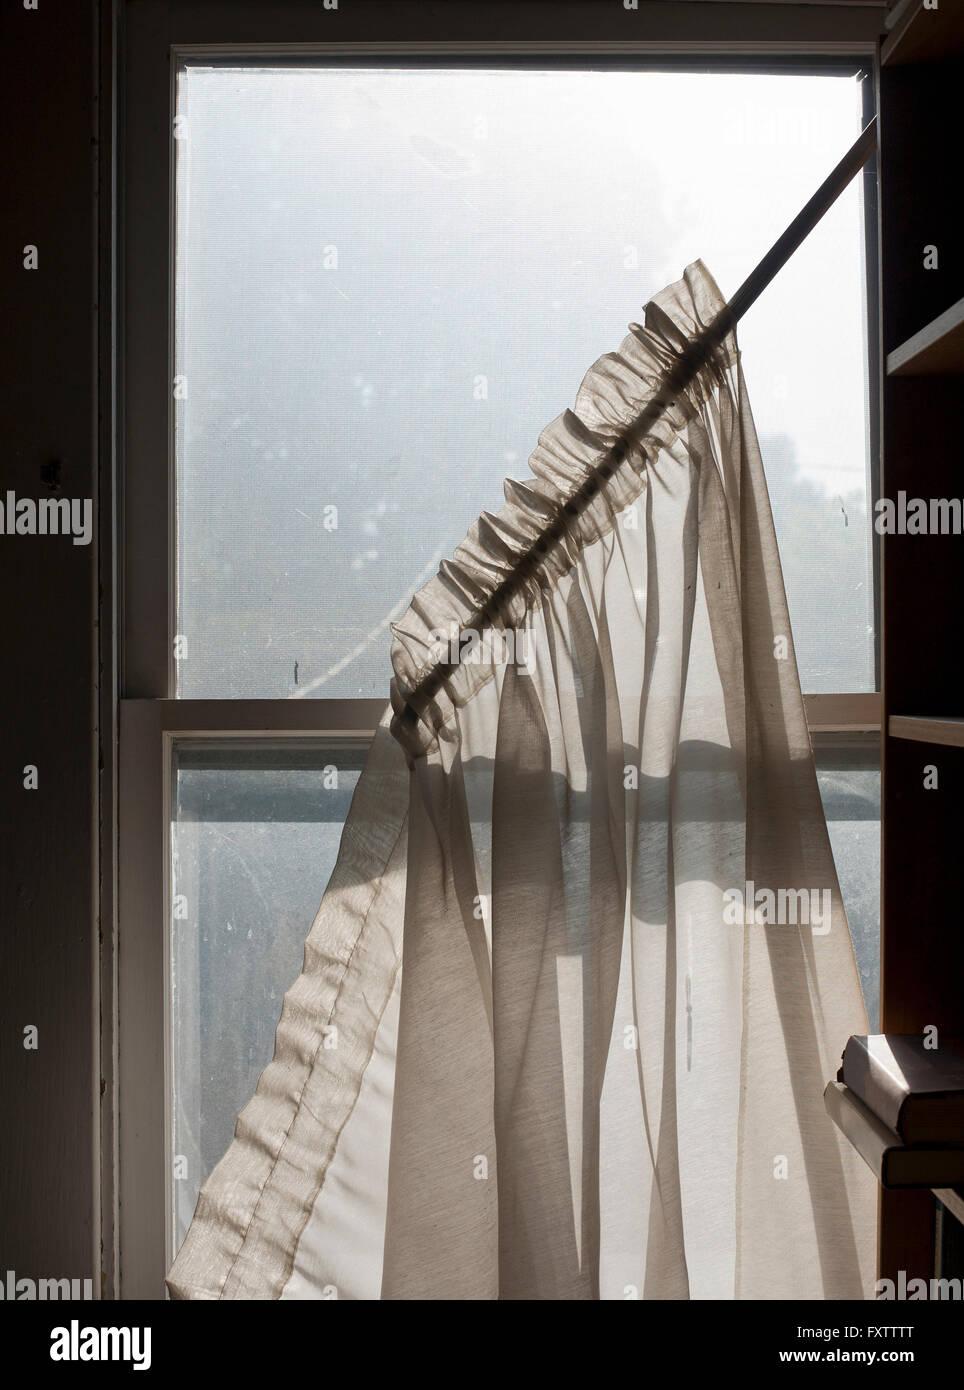 Gardinen schmutzig vom fallen Flügel Fenster Stockbild